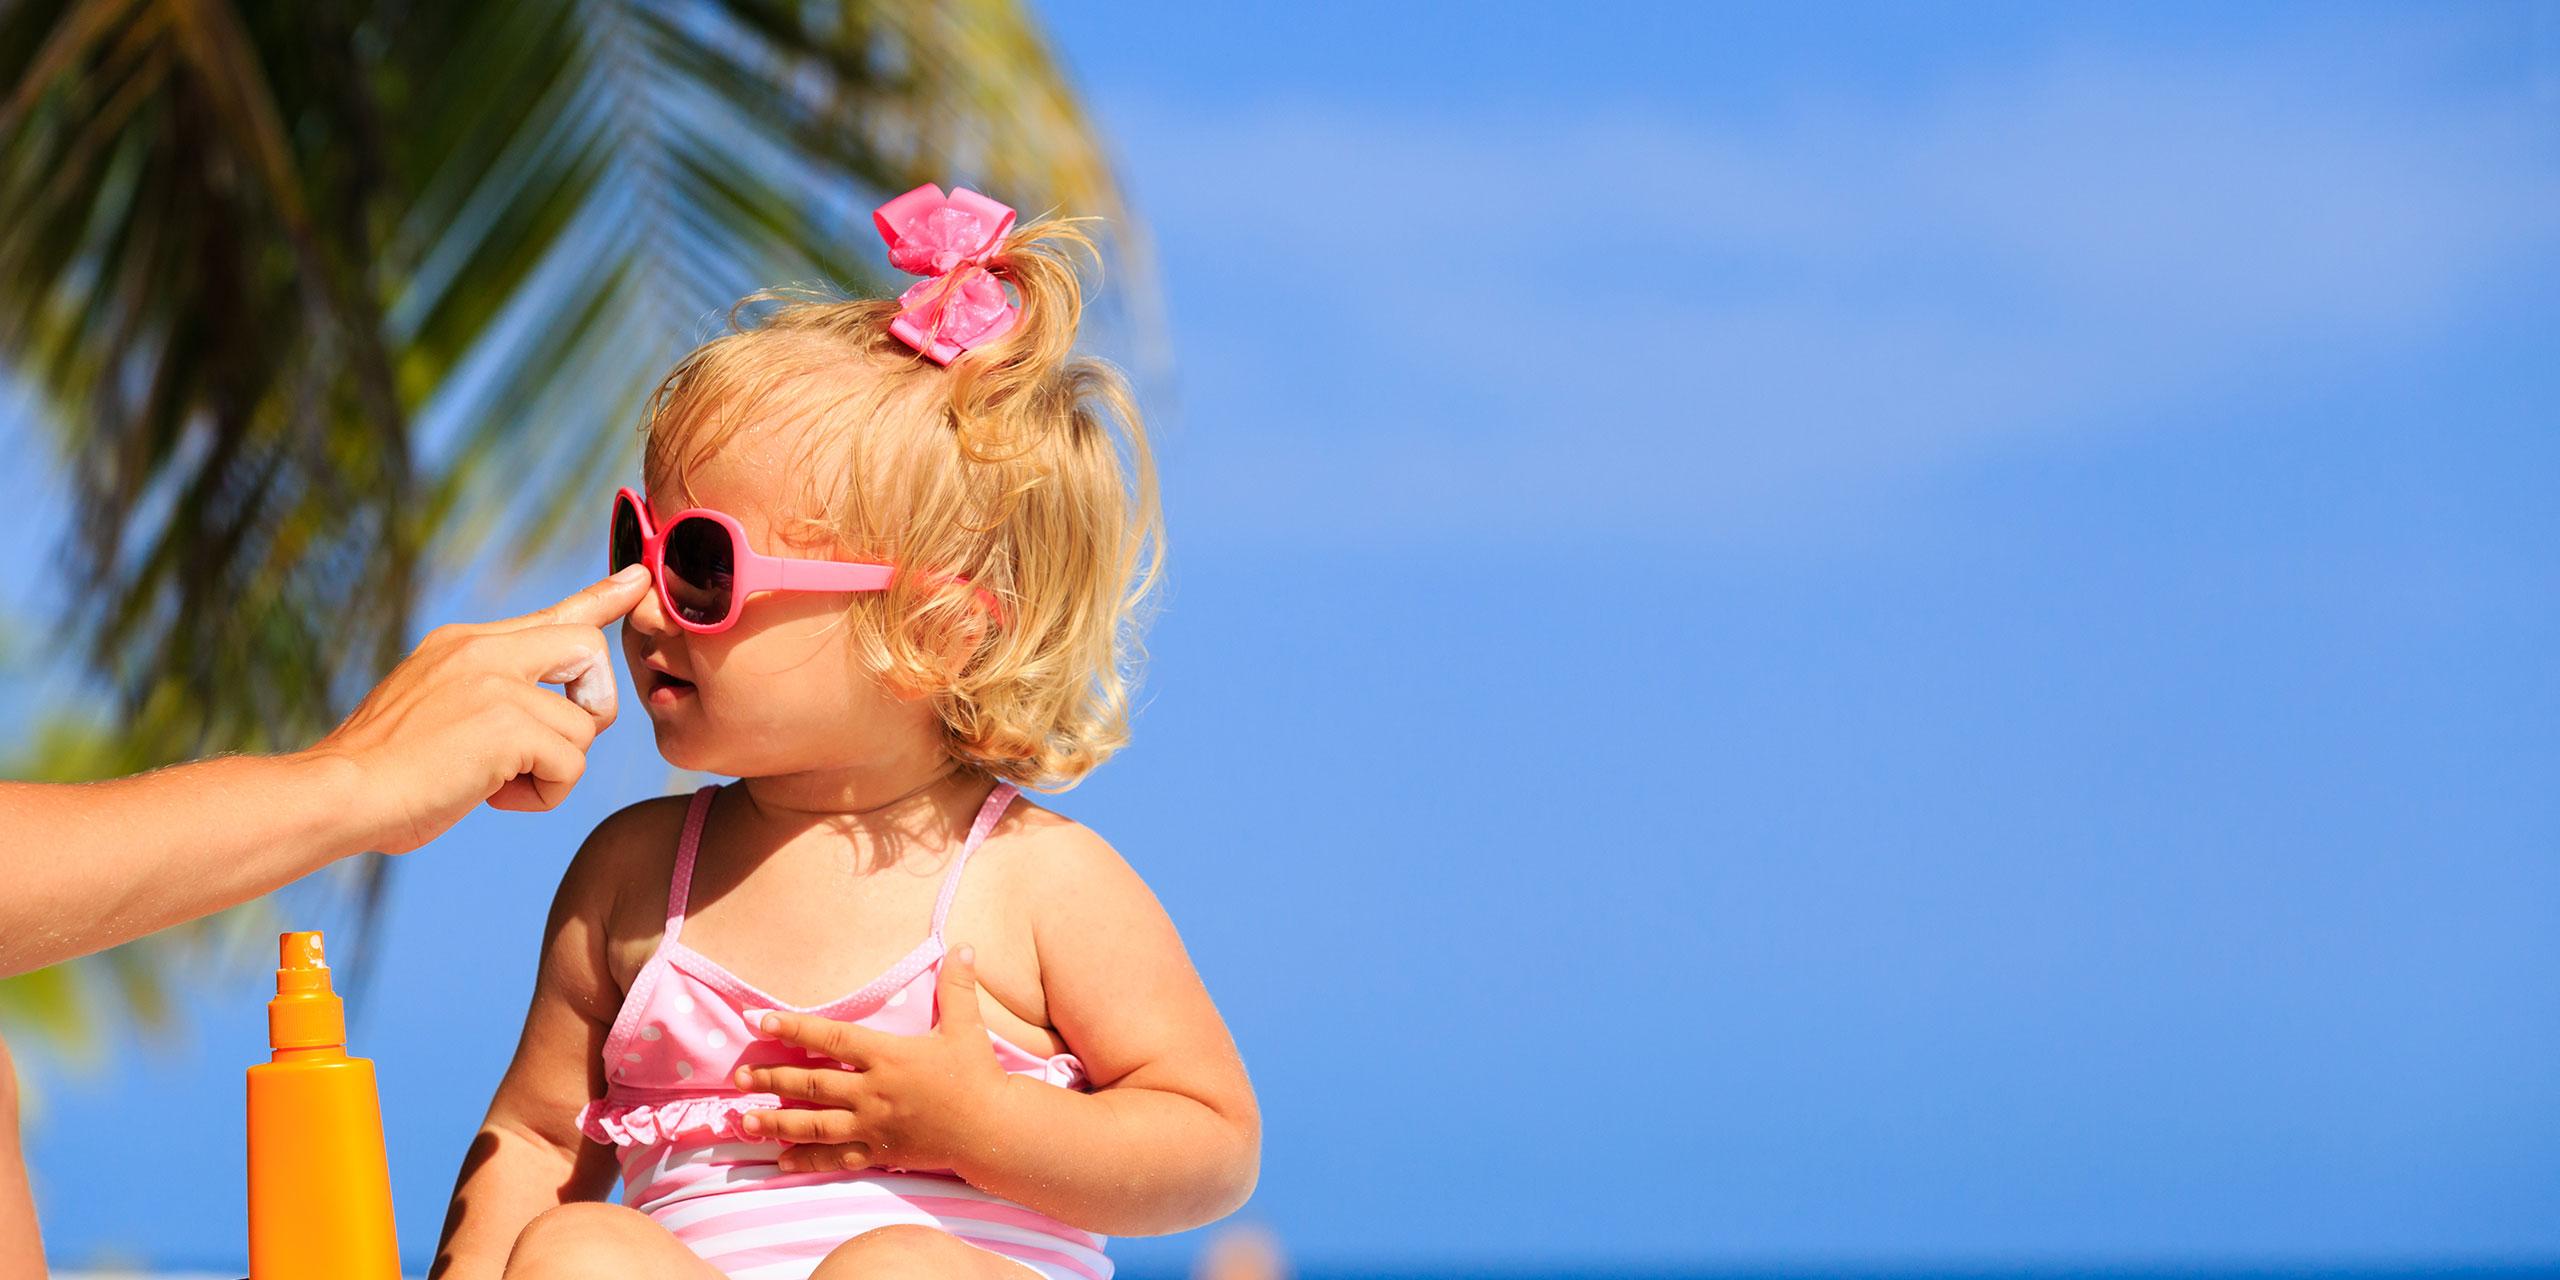 Baby Getting Sunscreen Applied; Courtesy of NadyaEugene/Shutterstock.com